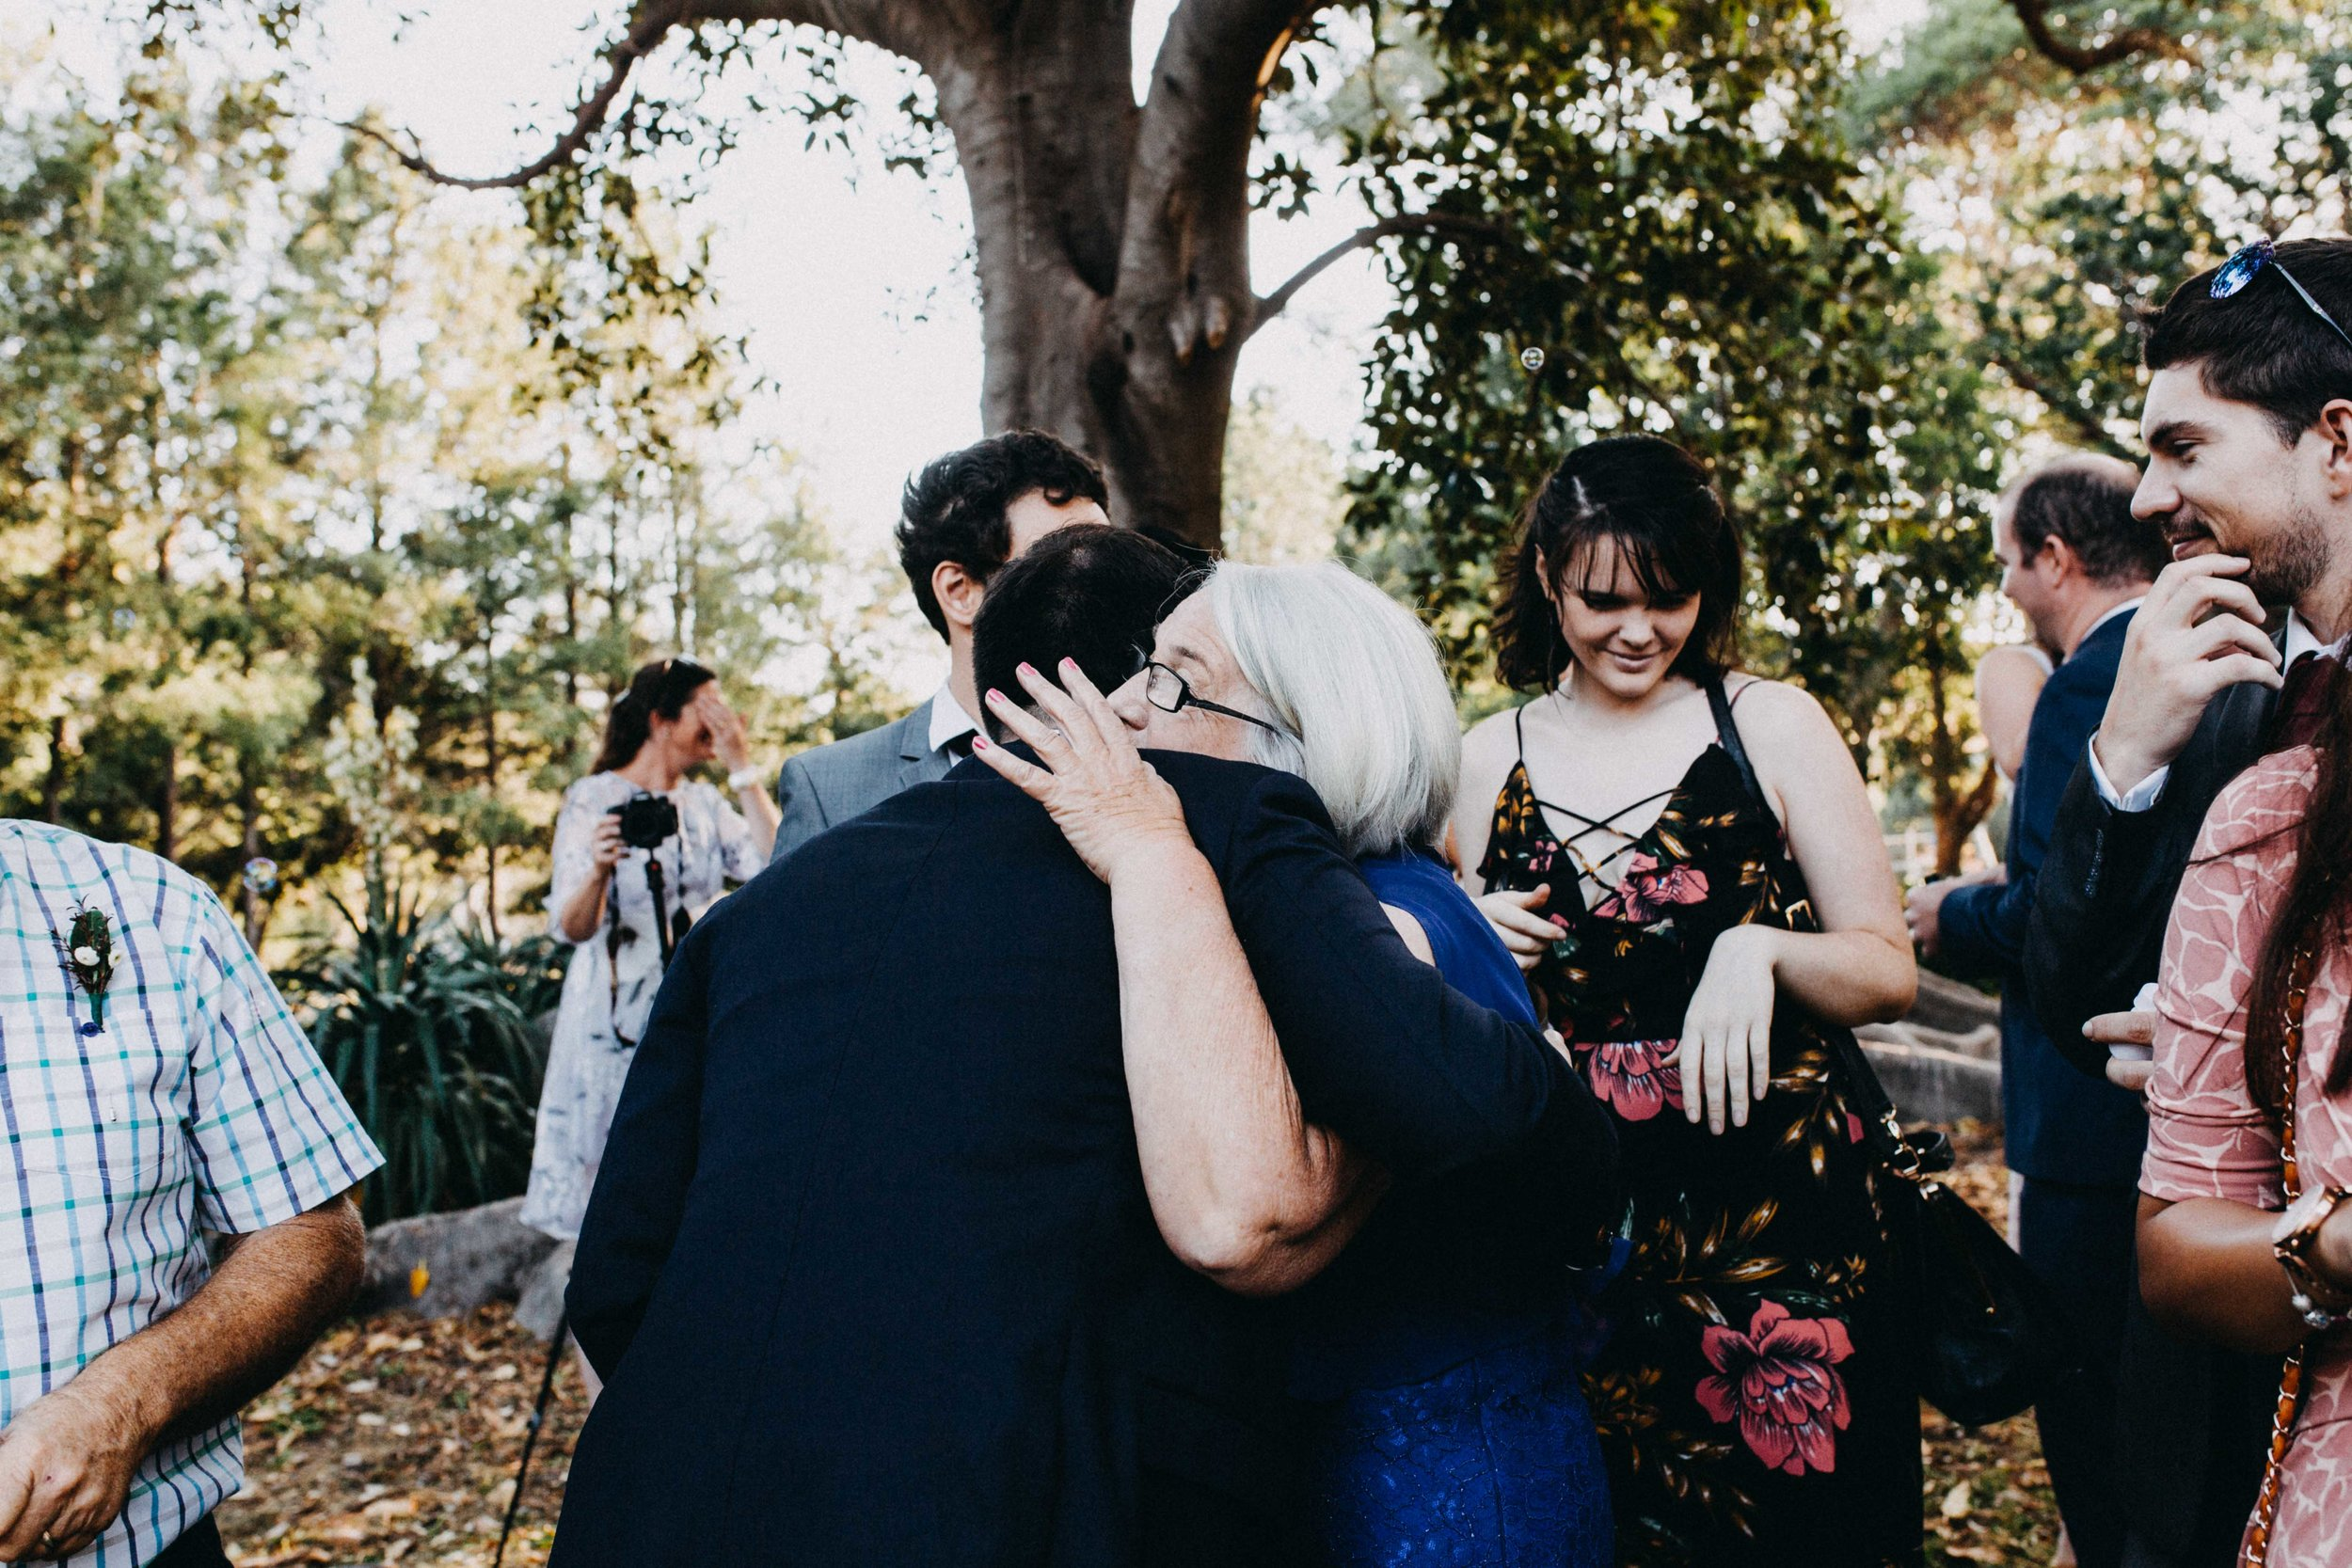 cabarita-park-sydney-wedding-emilyobrienphotography.net-36.jpg